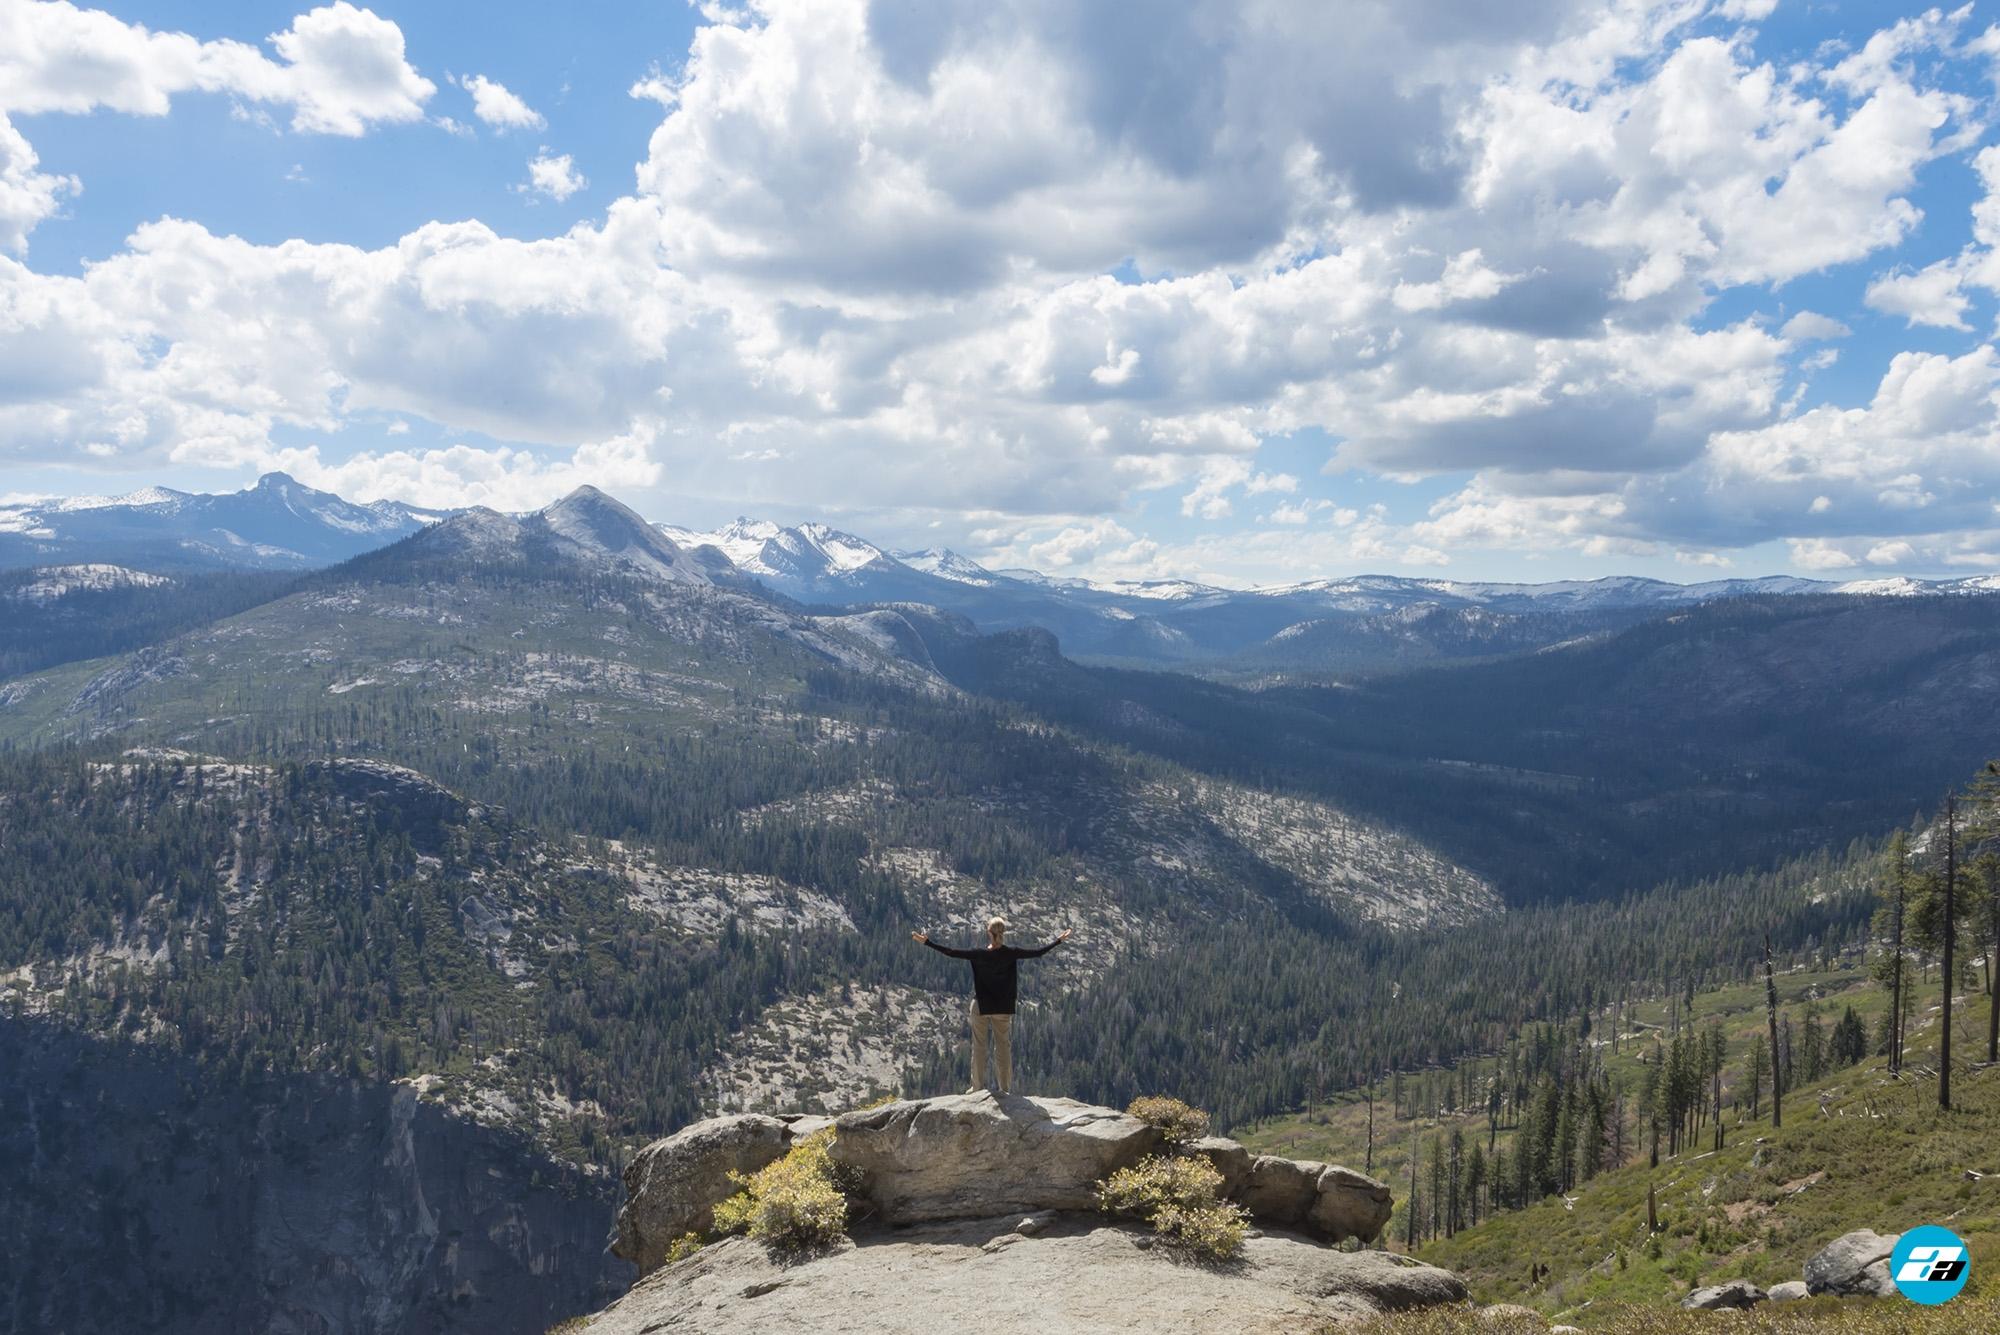 Yosemite National Park, California, USA. Landscape. Explorer. Solitude. Mountain View. Glacier Point.